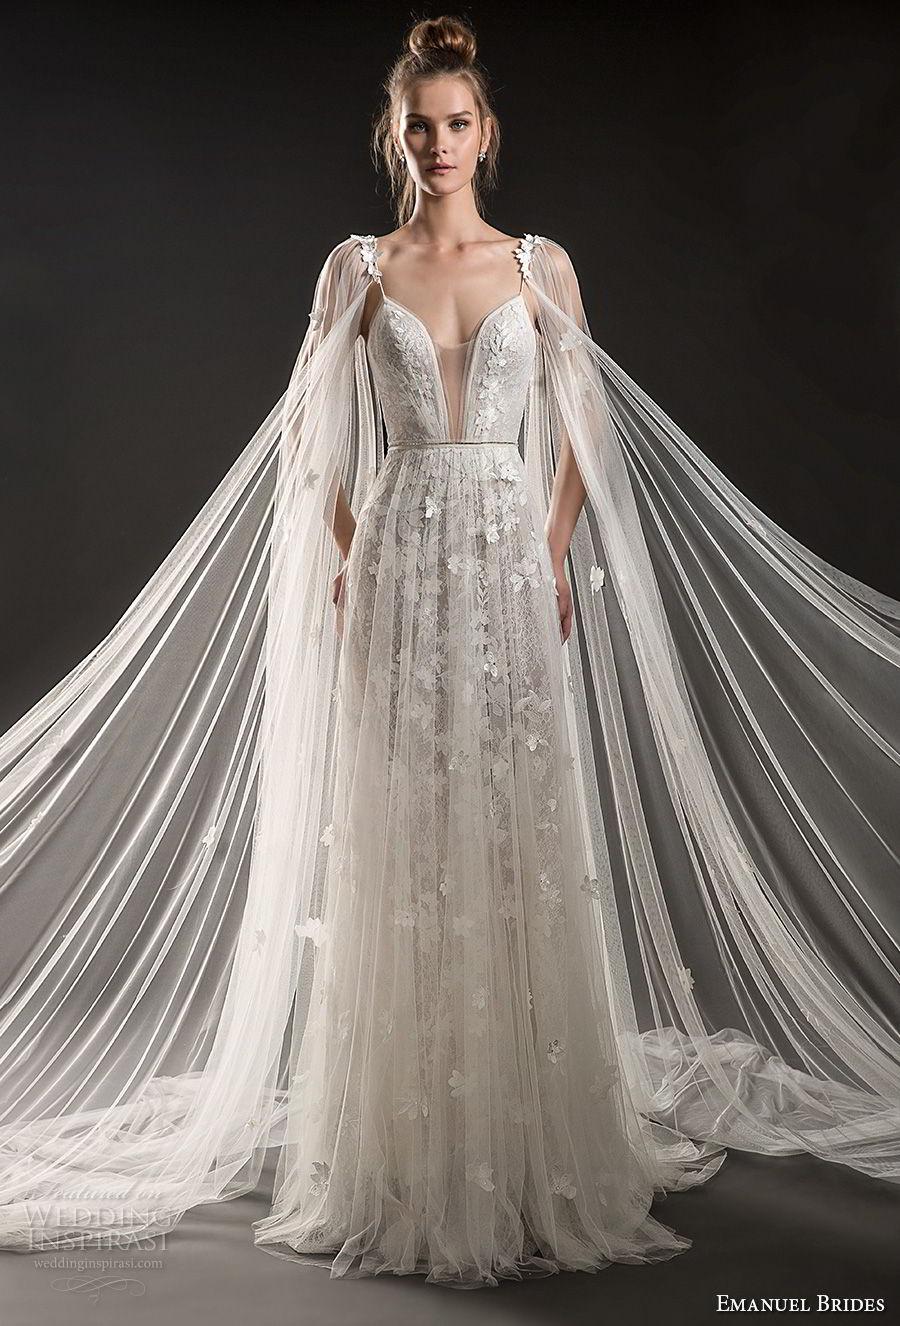 emanuel brides 2018 bridal sleeveless thin strap deep plunging sweetheart neckline full embellishment tulle skirt romantic sexy soft a  line wedding dress medium train (02) mv